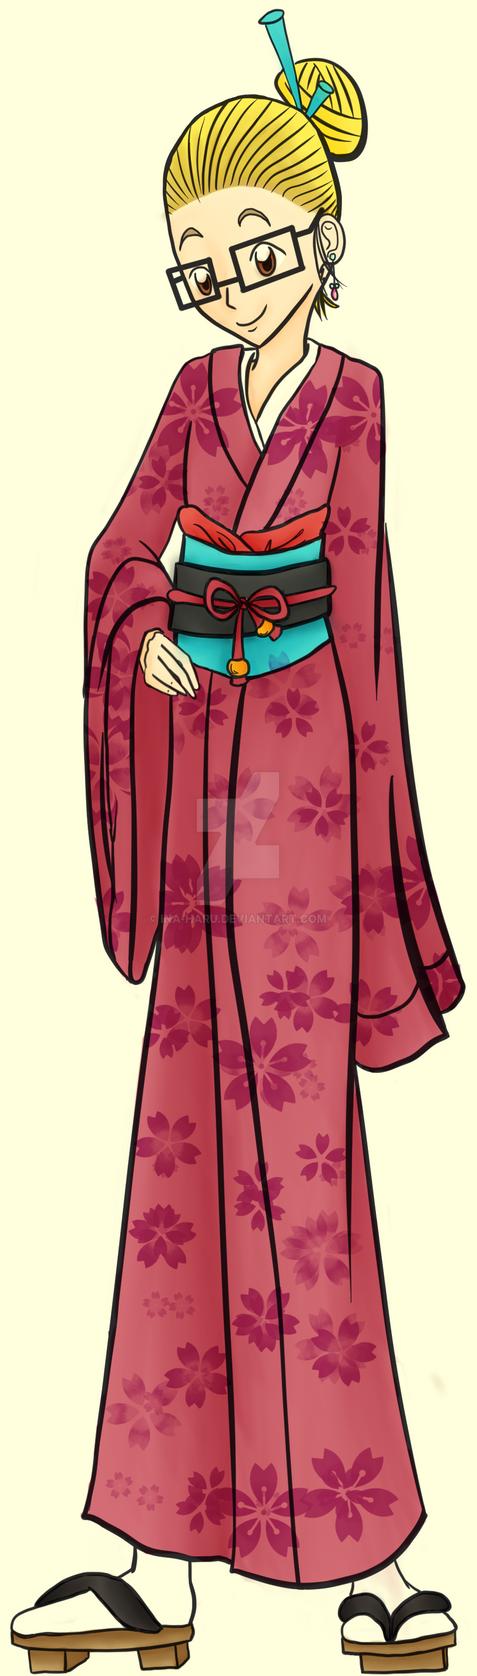 New Year's Kimono by Ina-Haru